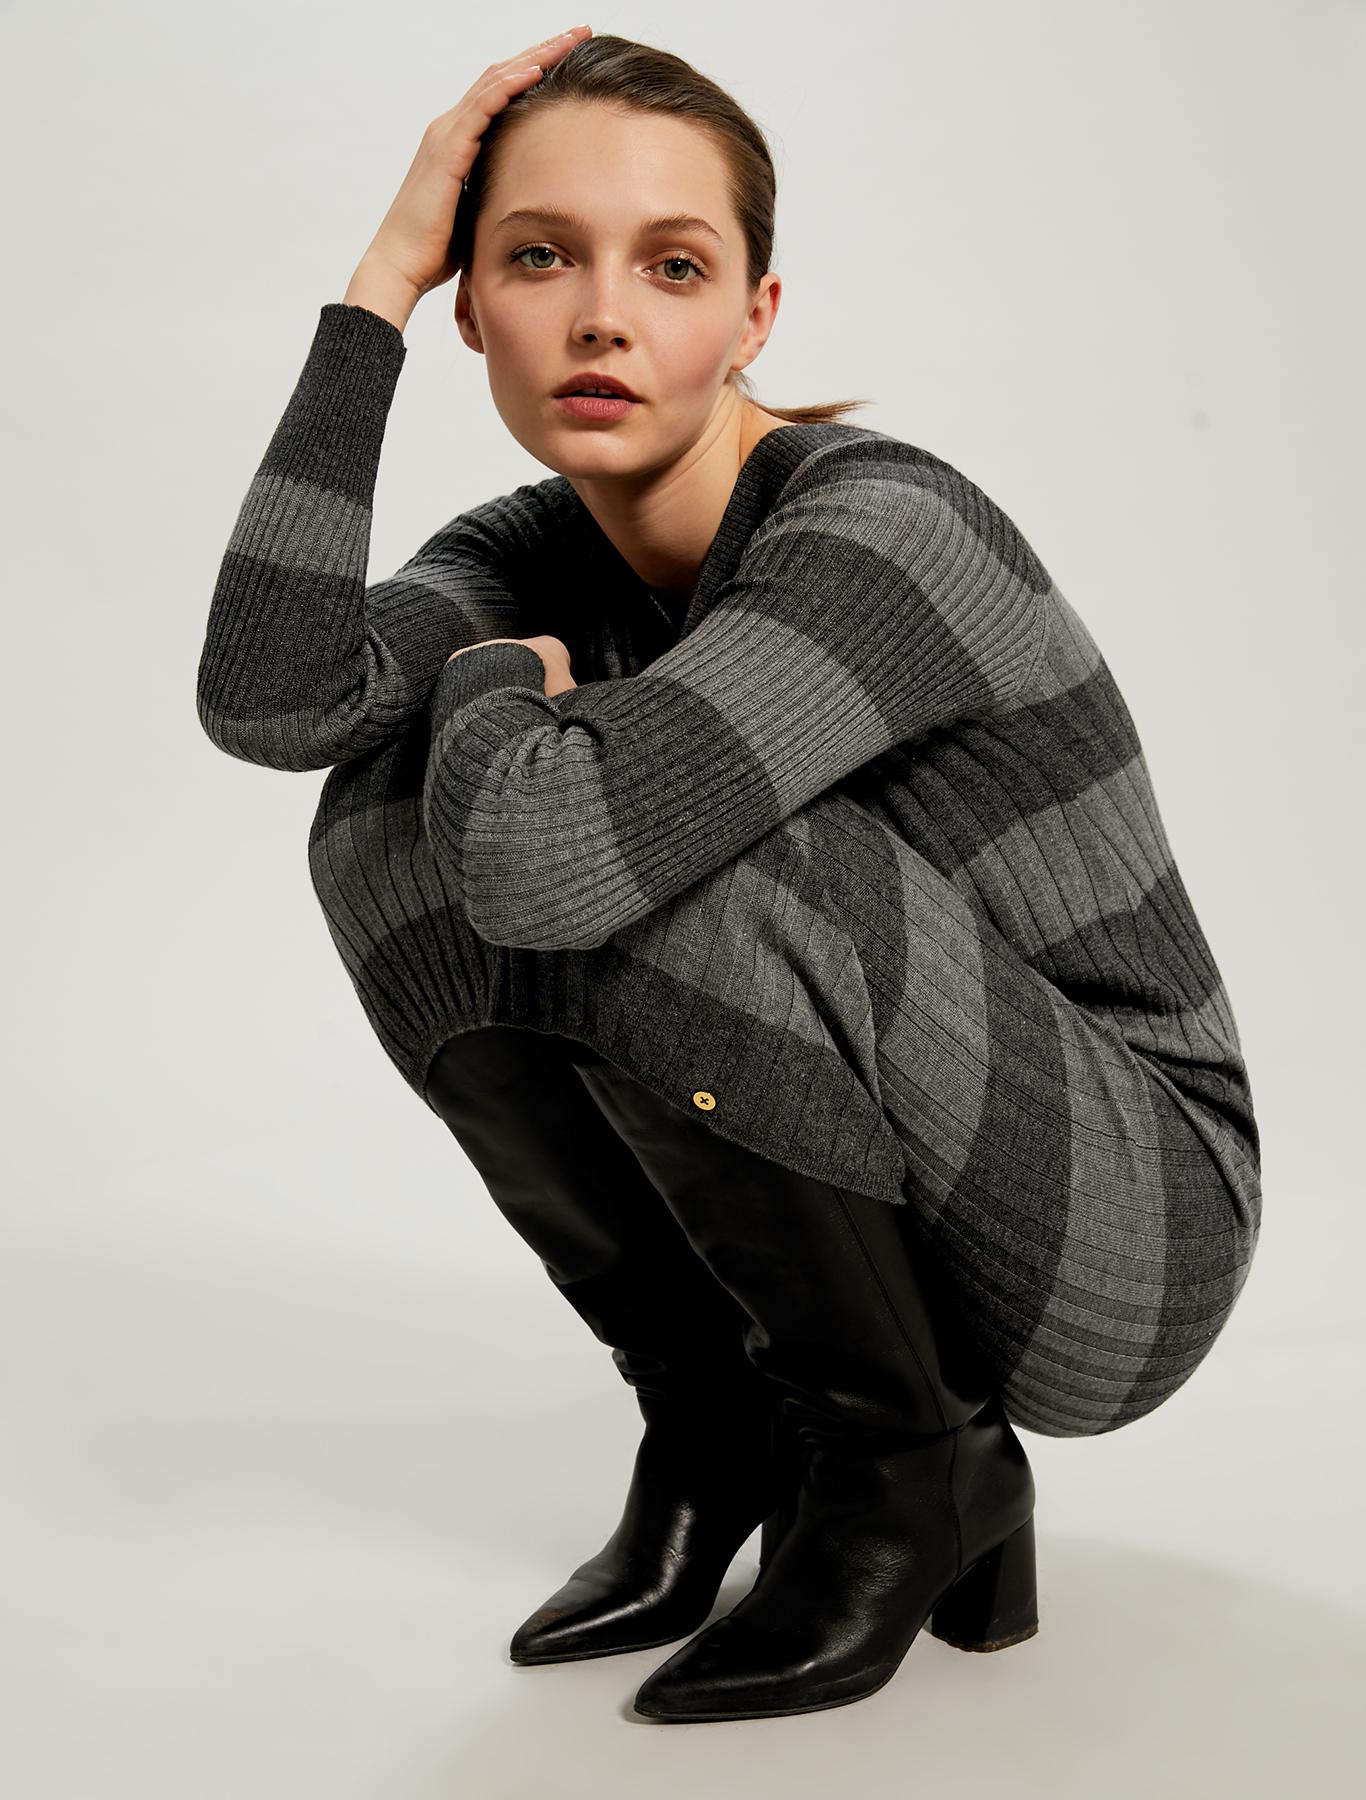 Knit sheath dress - light grey pattern - pennyblack